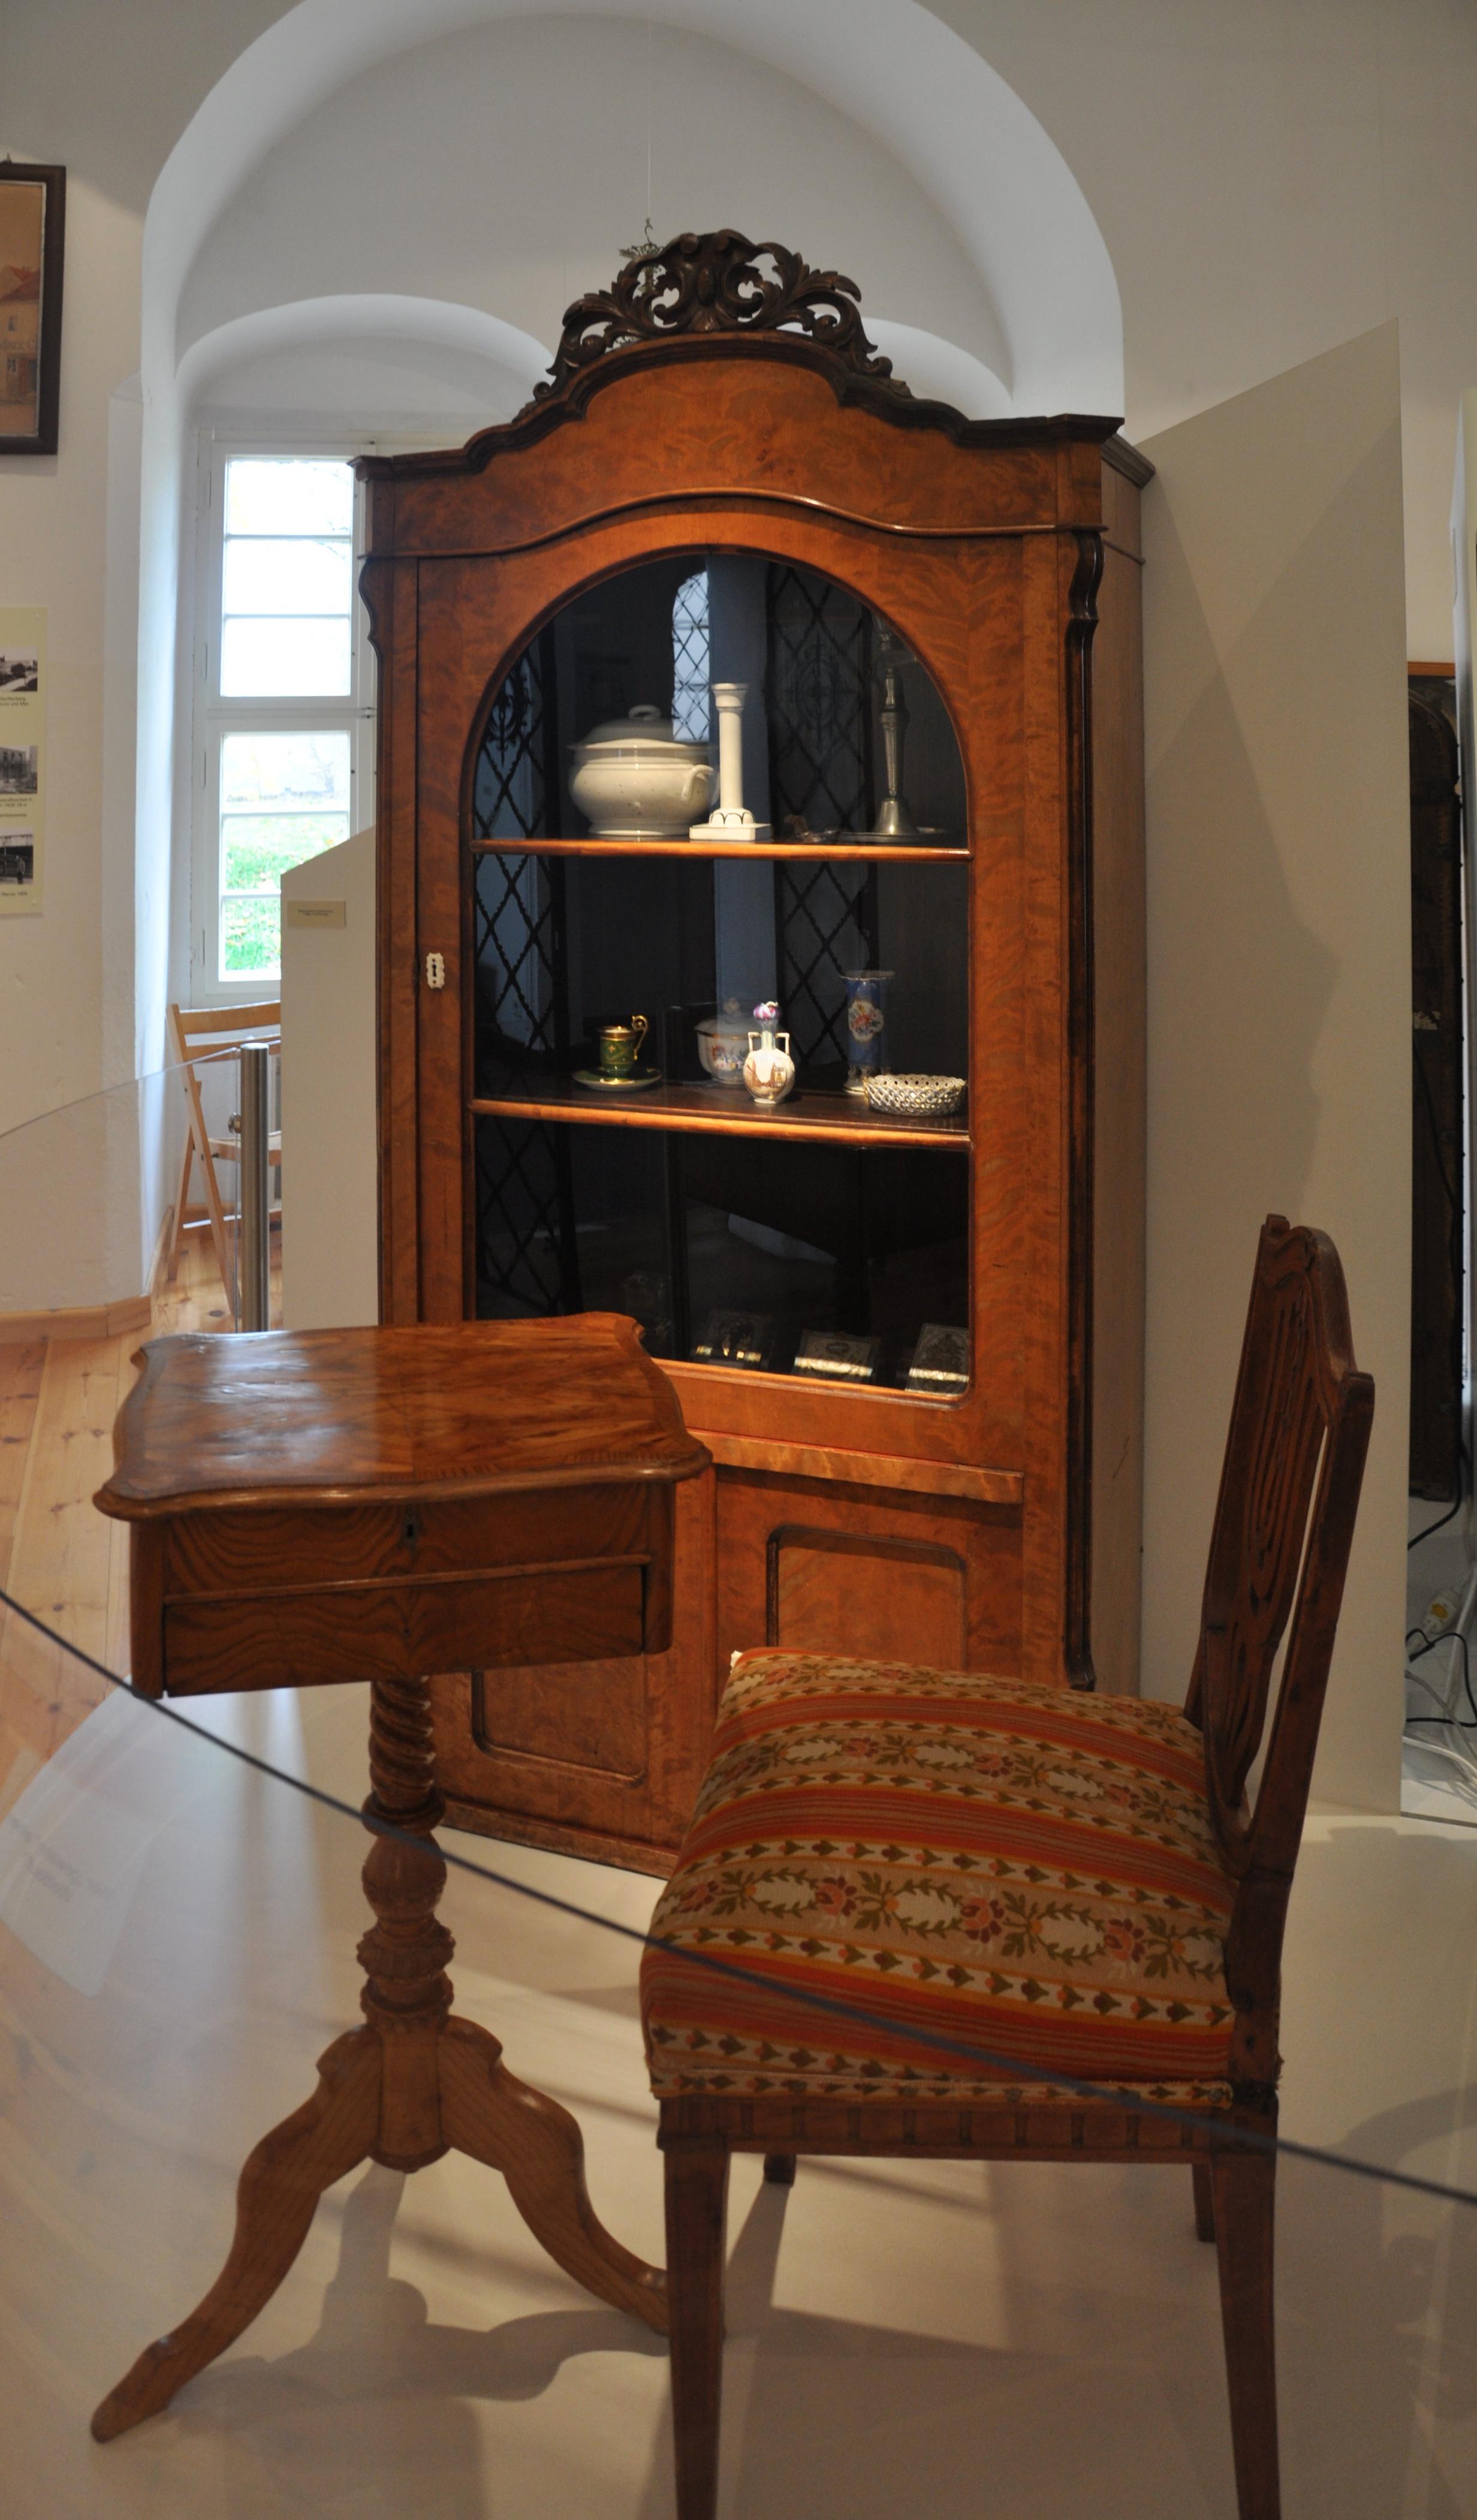 file m bel biedermeier museum wikimedia commons. Black Bedroom Furniture Sets. Home Design Ideas